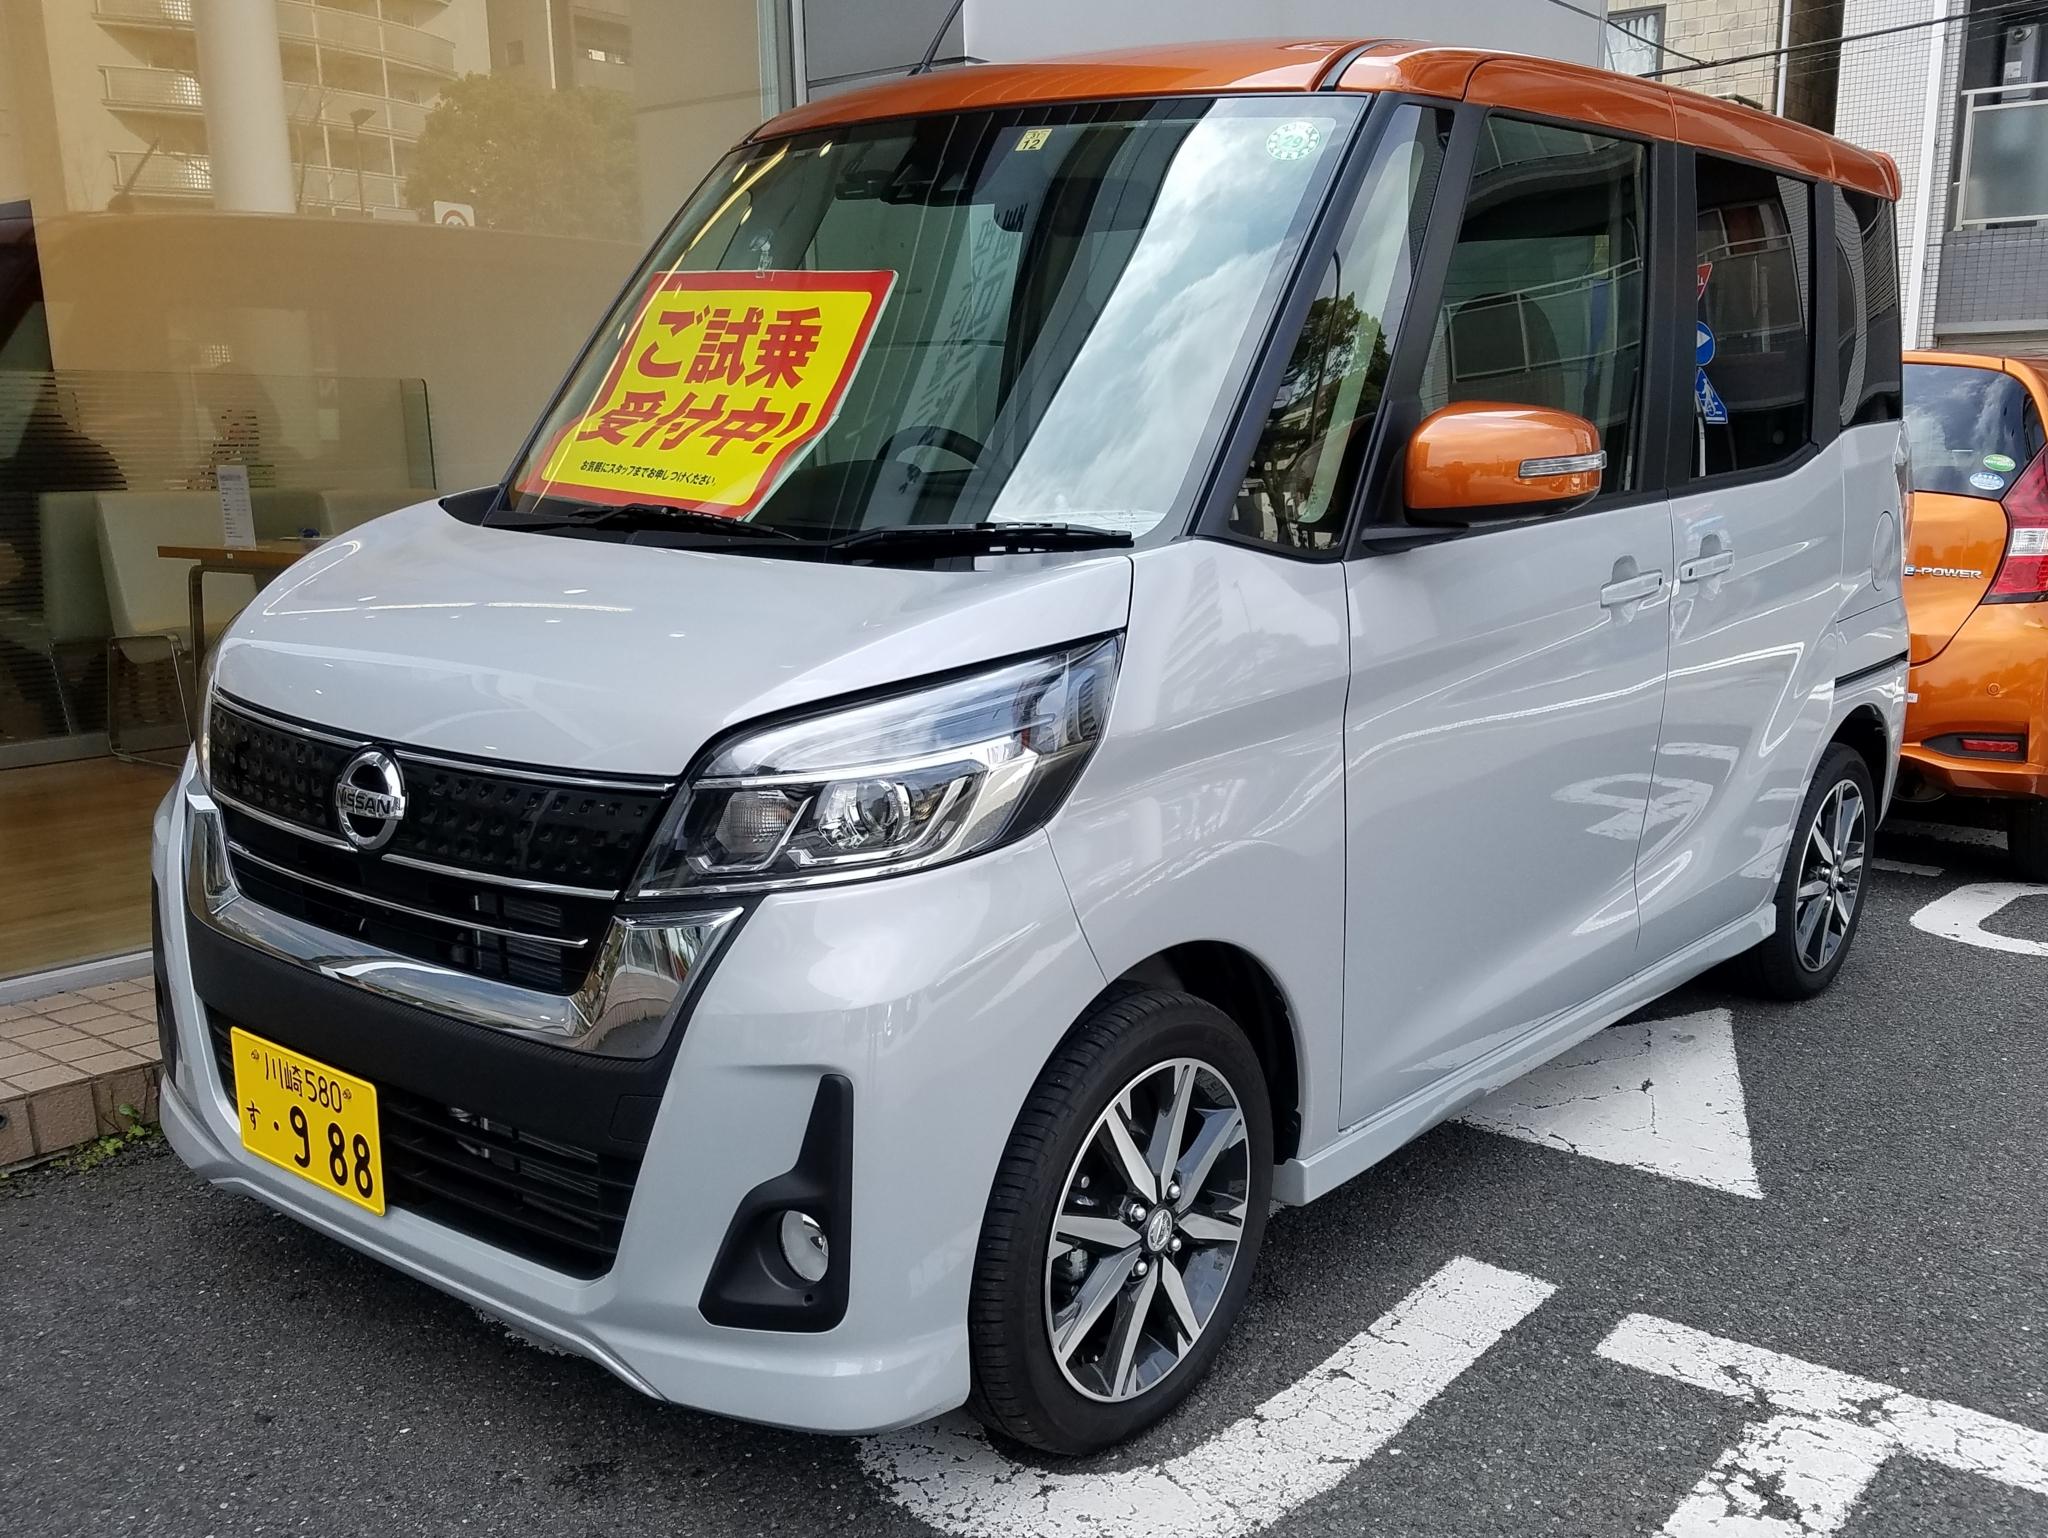 f:id:ToshUeno:20170402103614j:plain